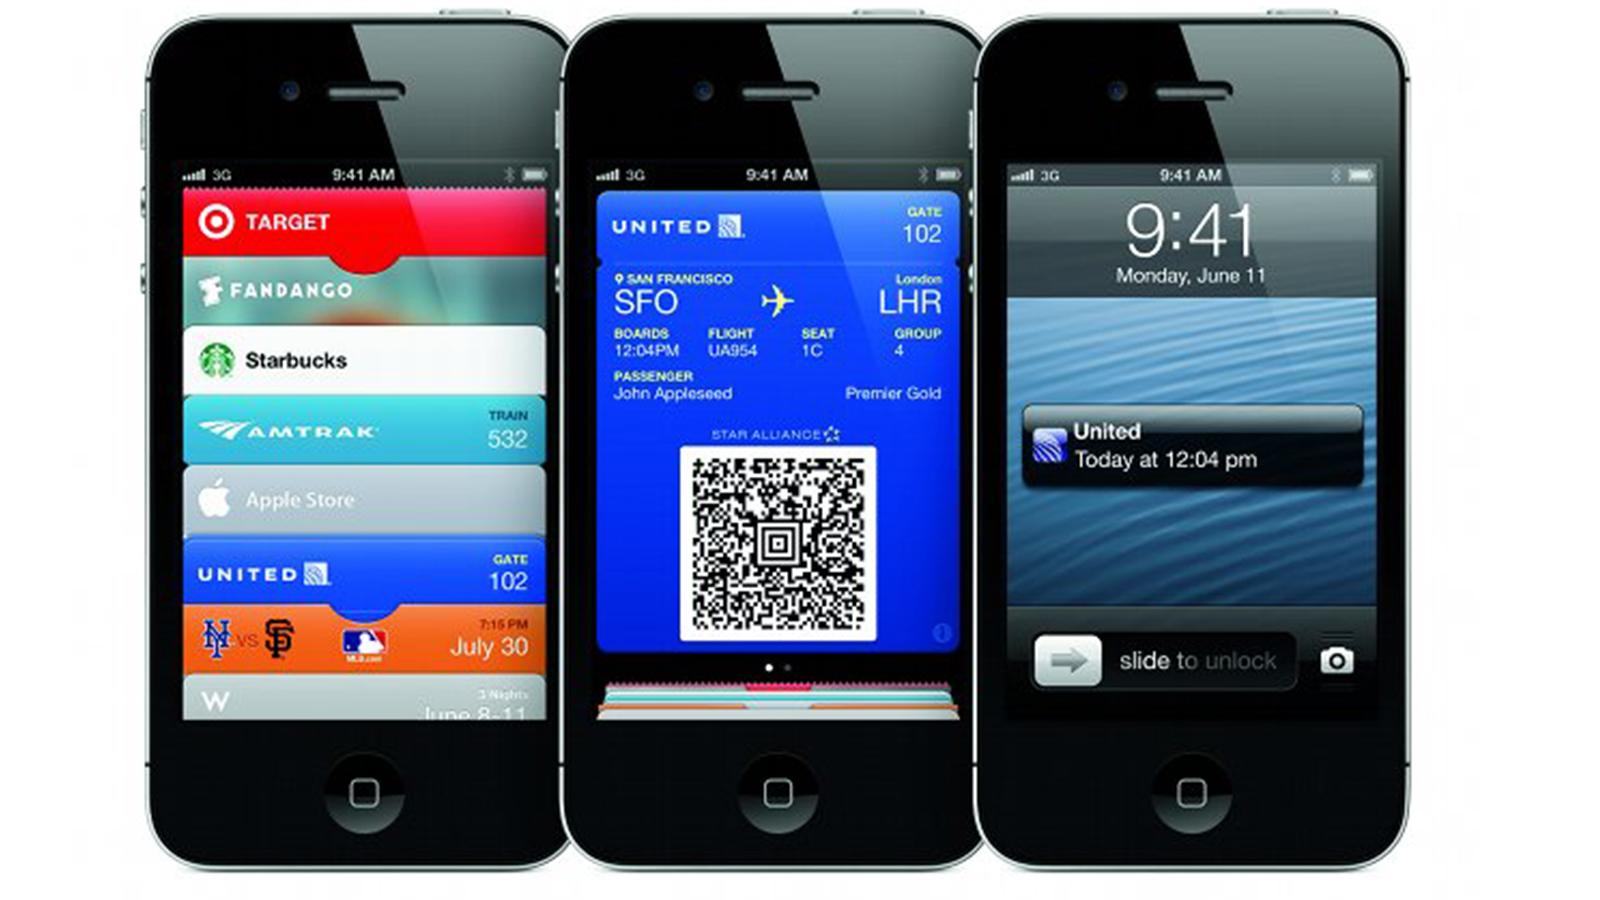 iOS 6 - Passbook